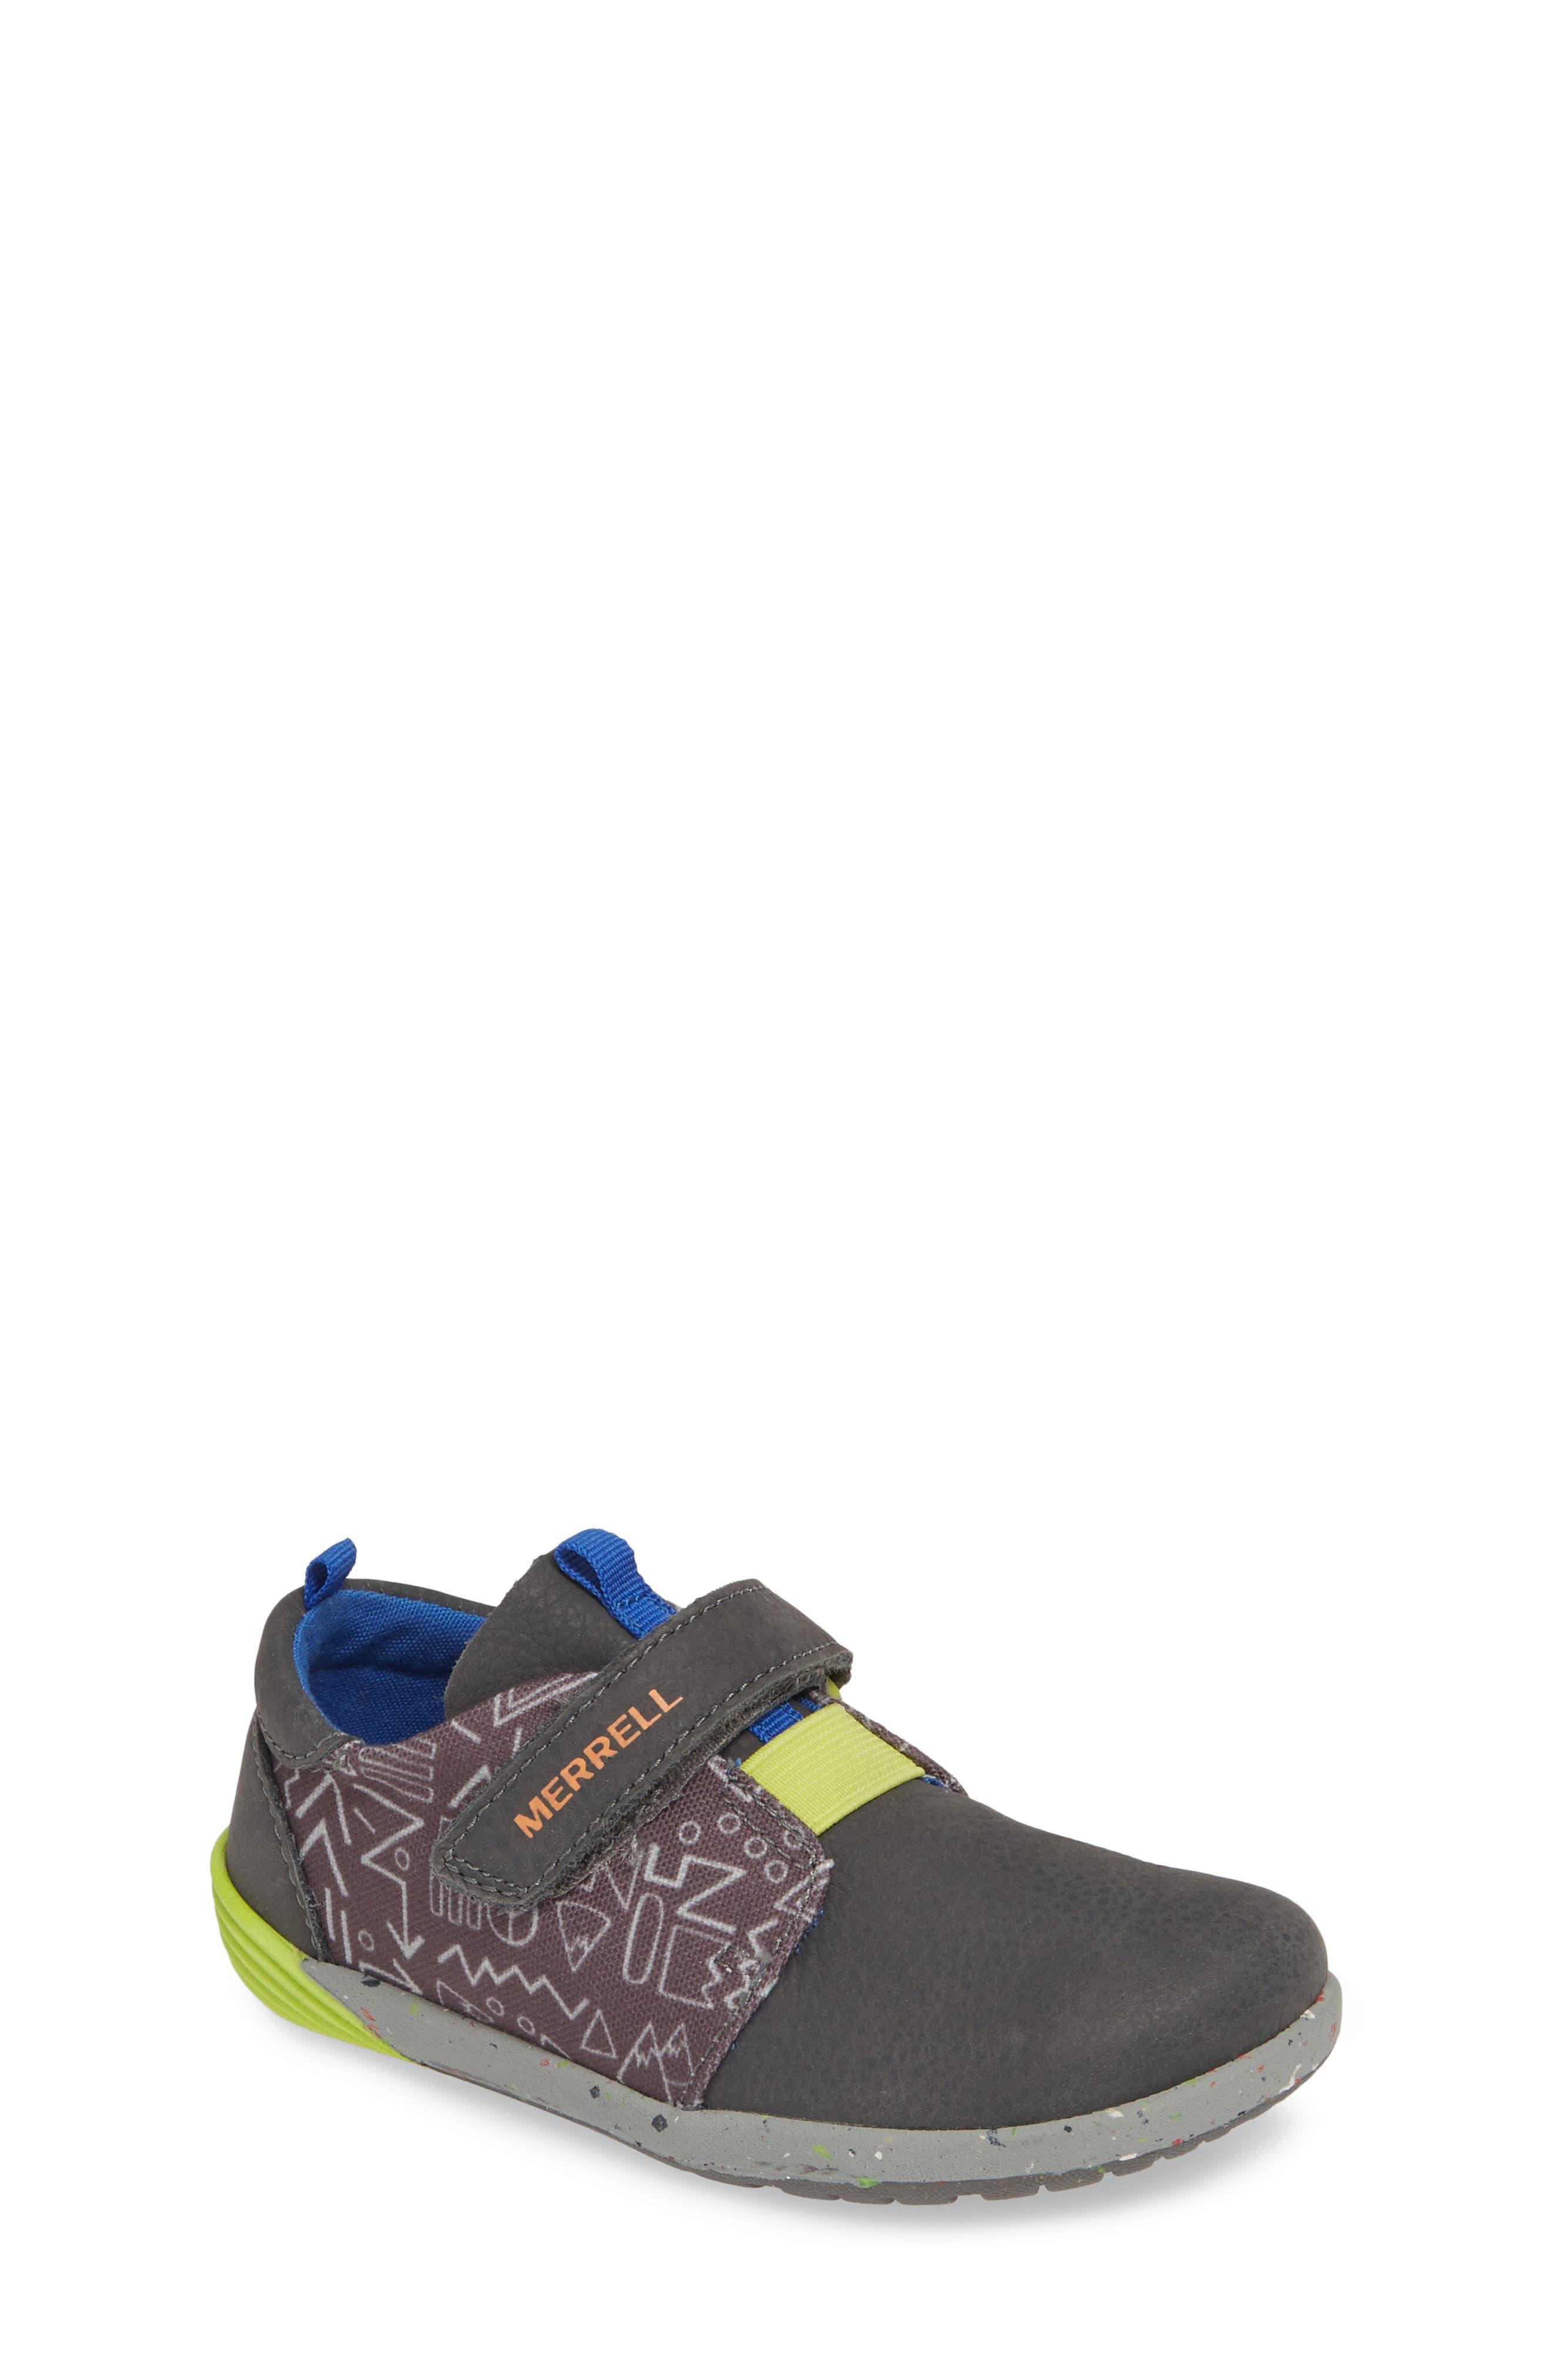 MERRELL, Bare Steps Sneaker, Main thumbnail 1, color, GREY